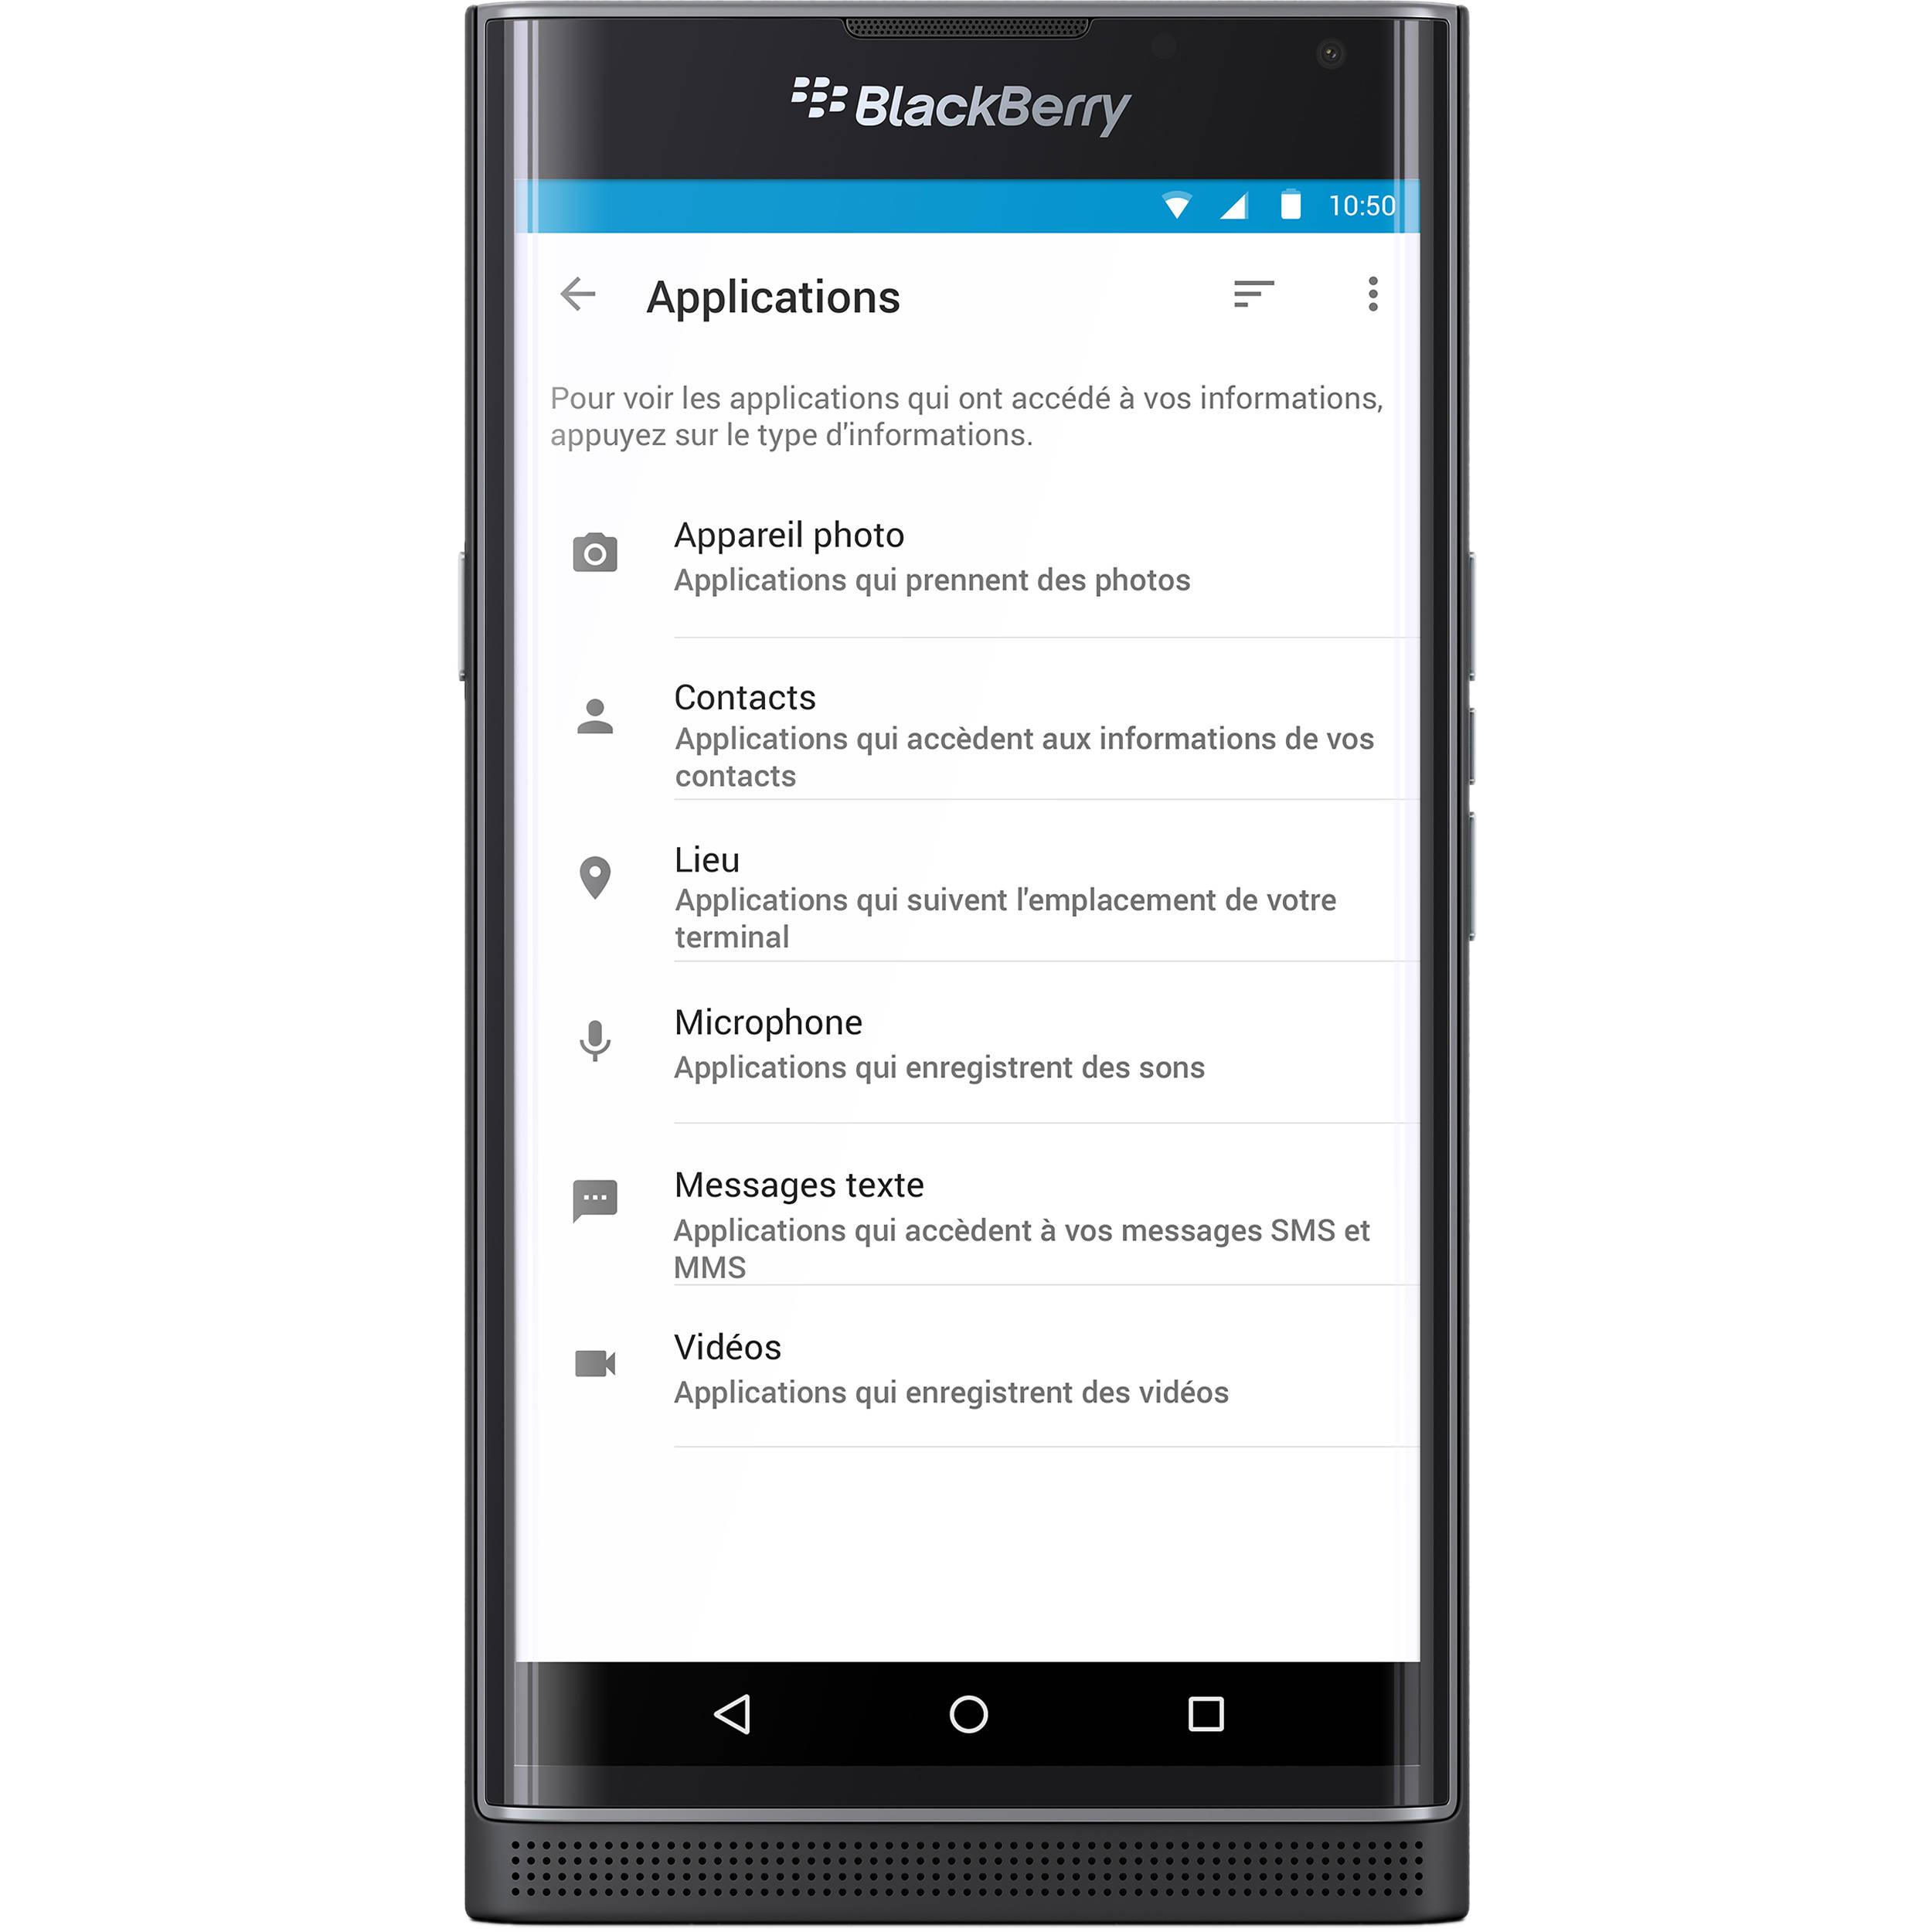 Priv BlackBerry 32GB Smartphone (Unlocked, Black)